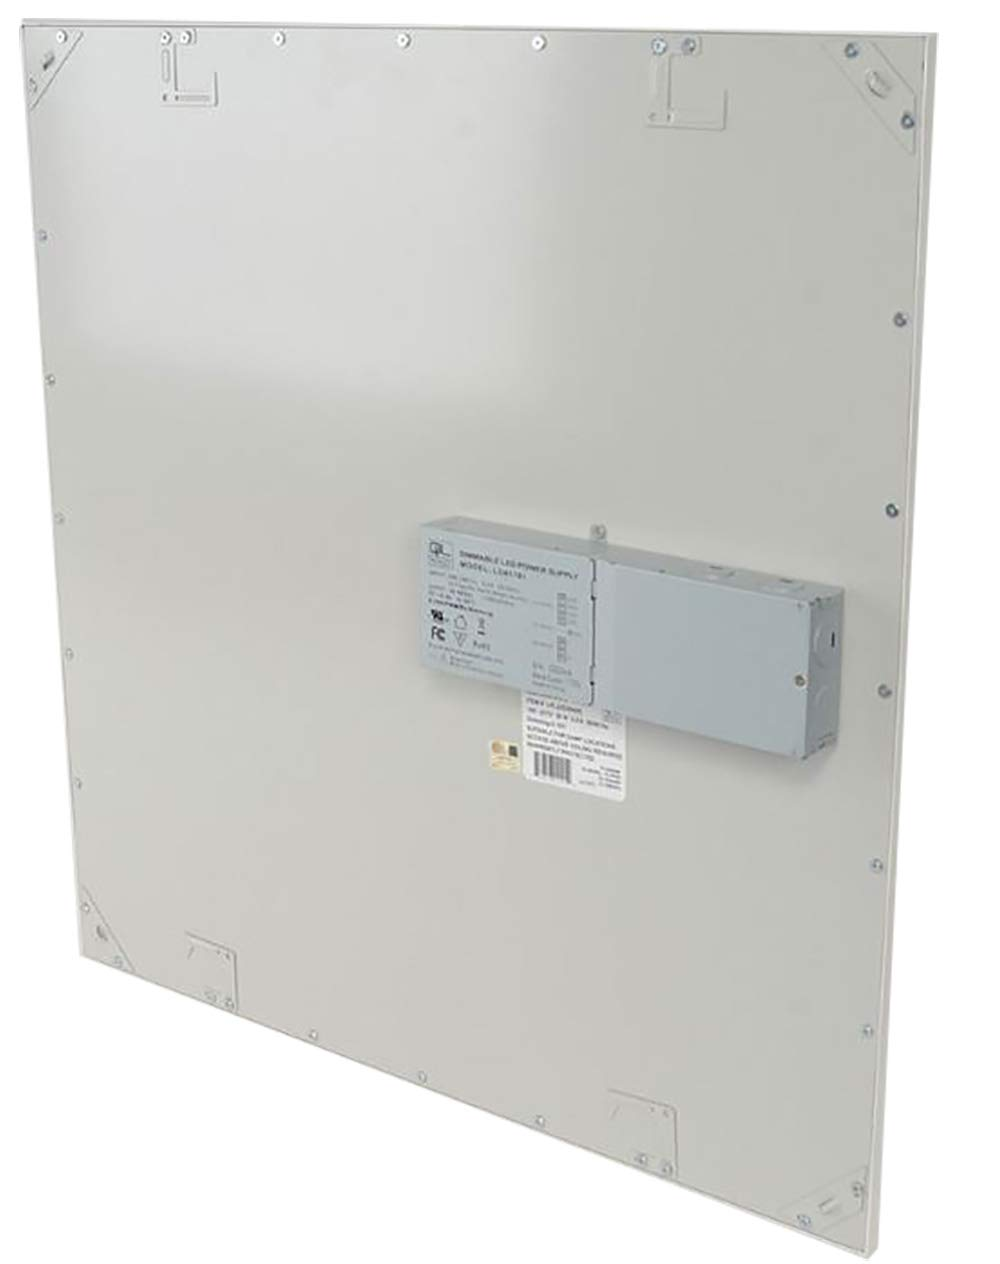 TCP 8 Pack 2x2 FT LED Flat Panel Light Fixture, 36W - 3600 Lumens, 5000K Daylight, 110V-277V, 0-10V Dimming by TC (Image #4)